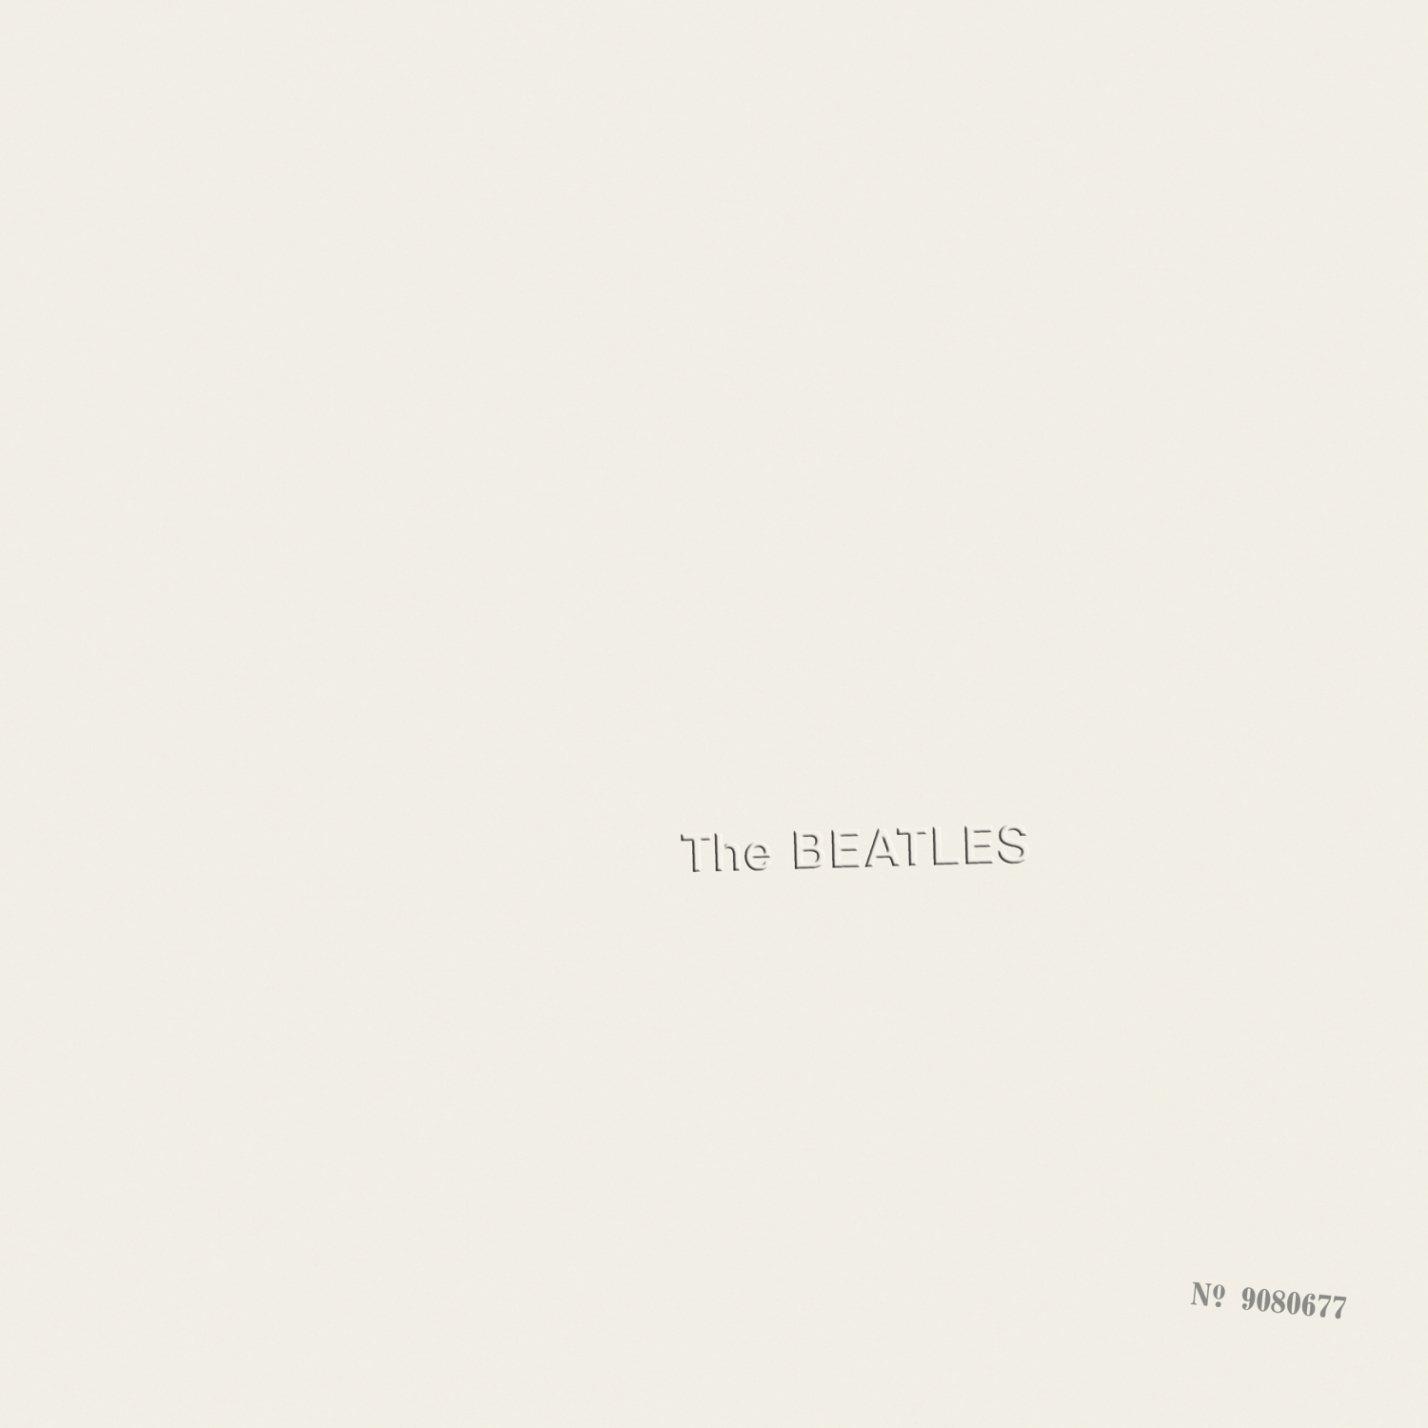 The Beatles (The White Album) [Mono][2 LP] by Capitol